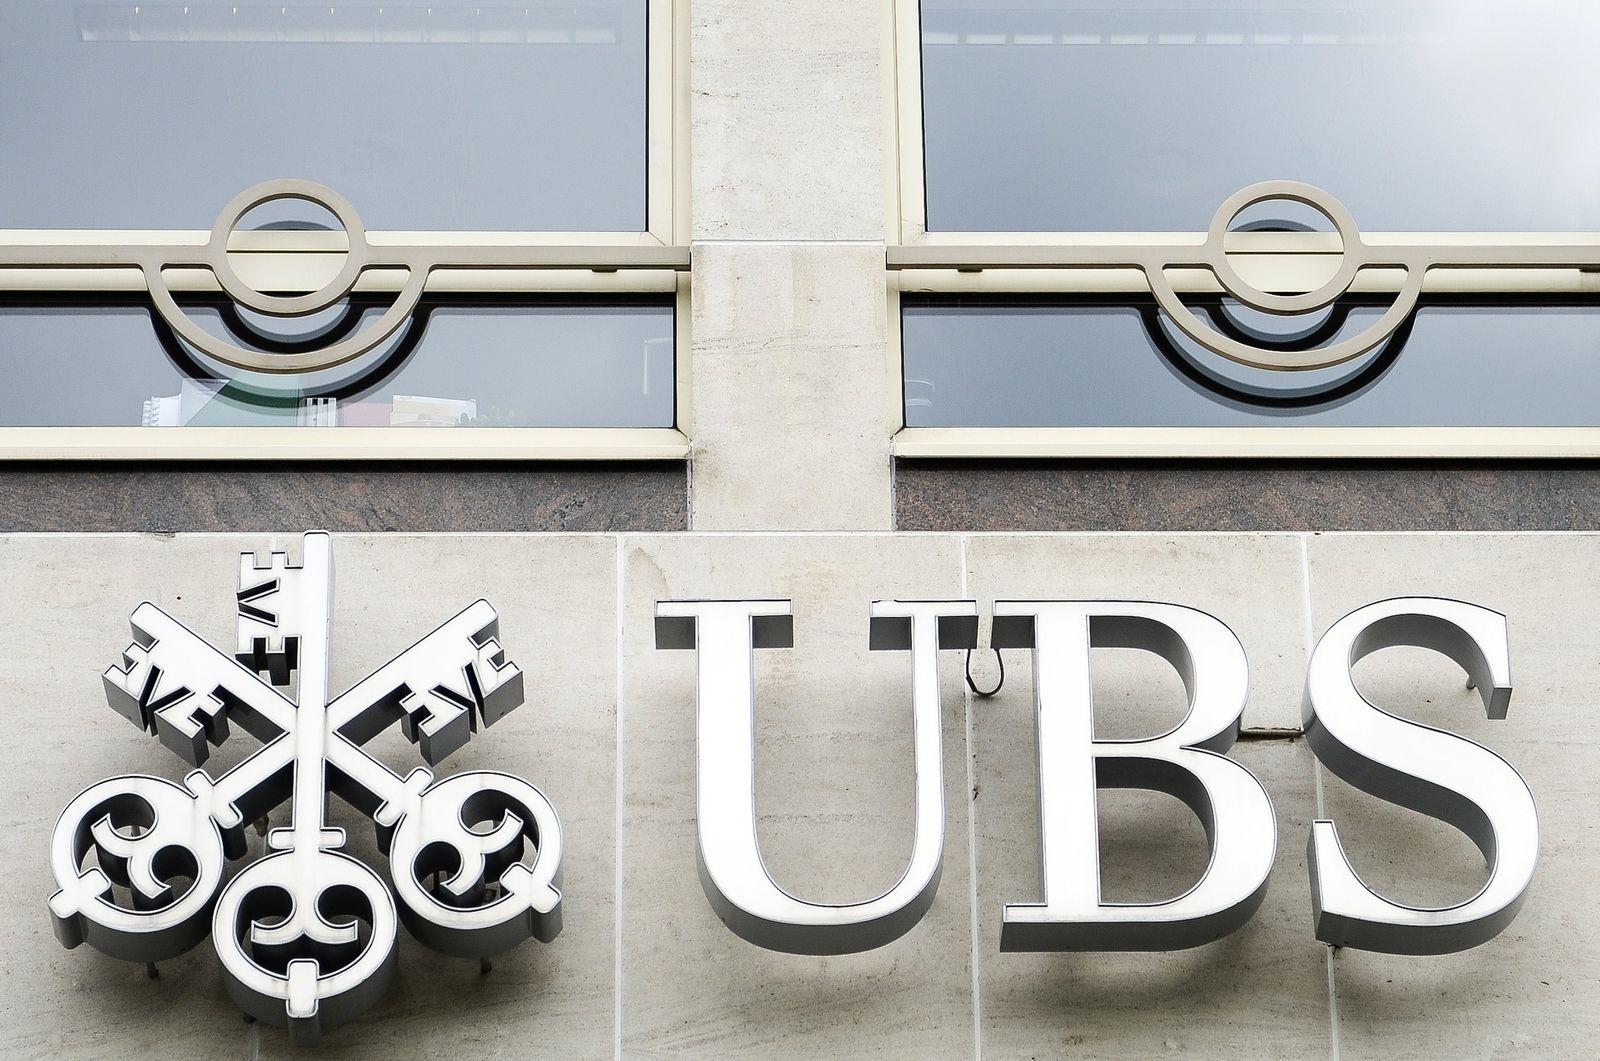 BELGIUM-SWITZERLAND-BANKING-CRIME-FRAUD